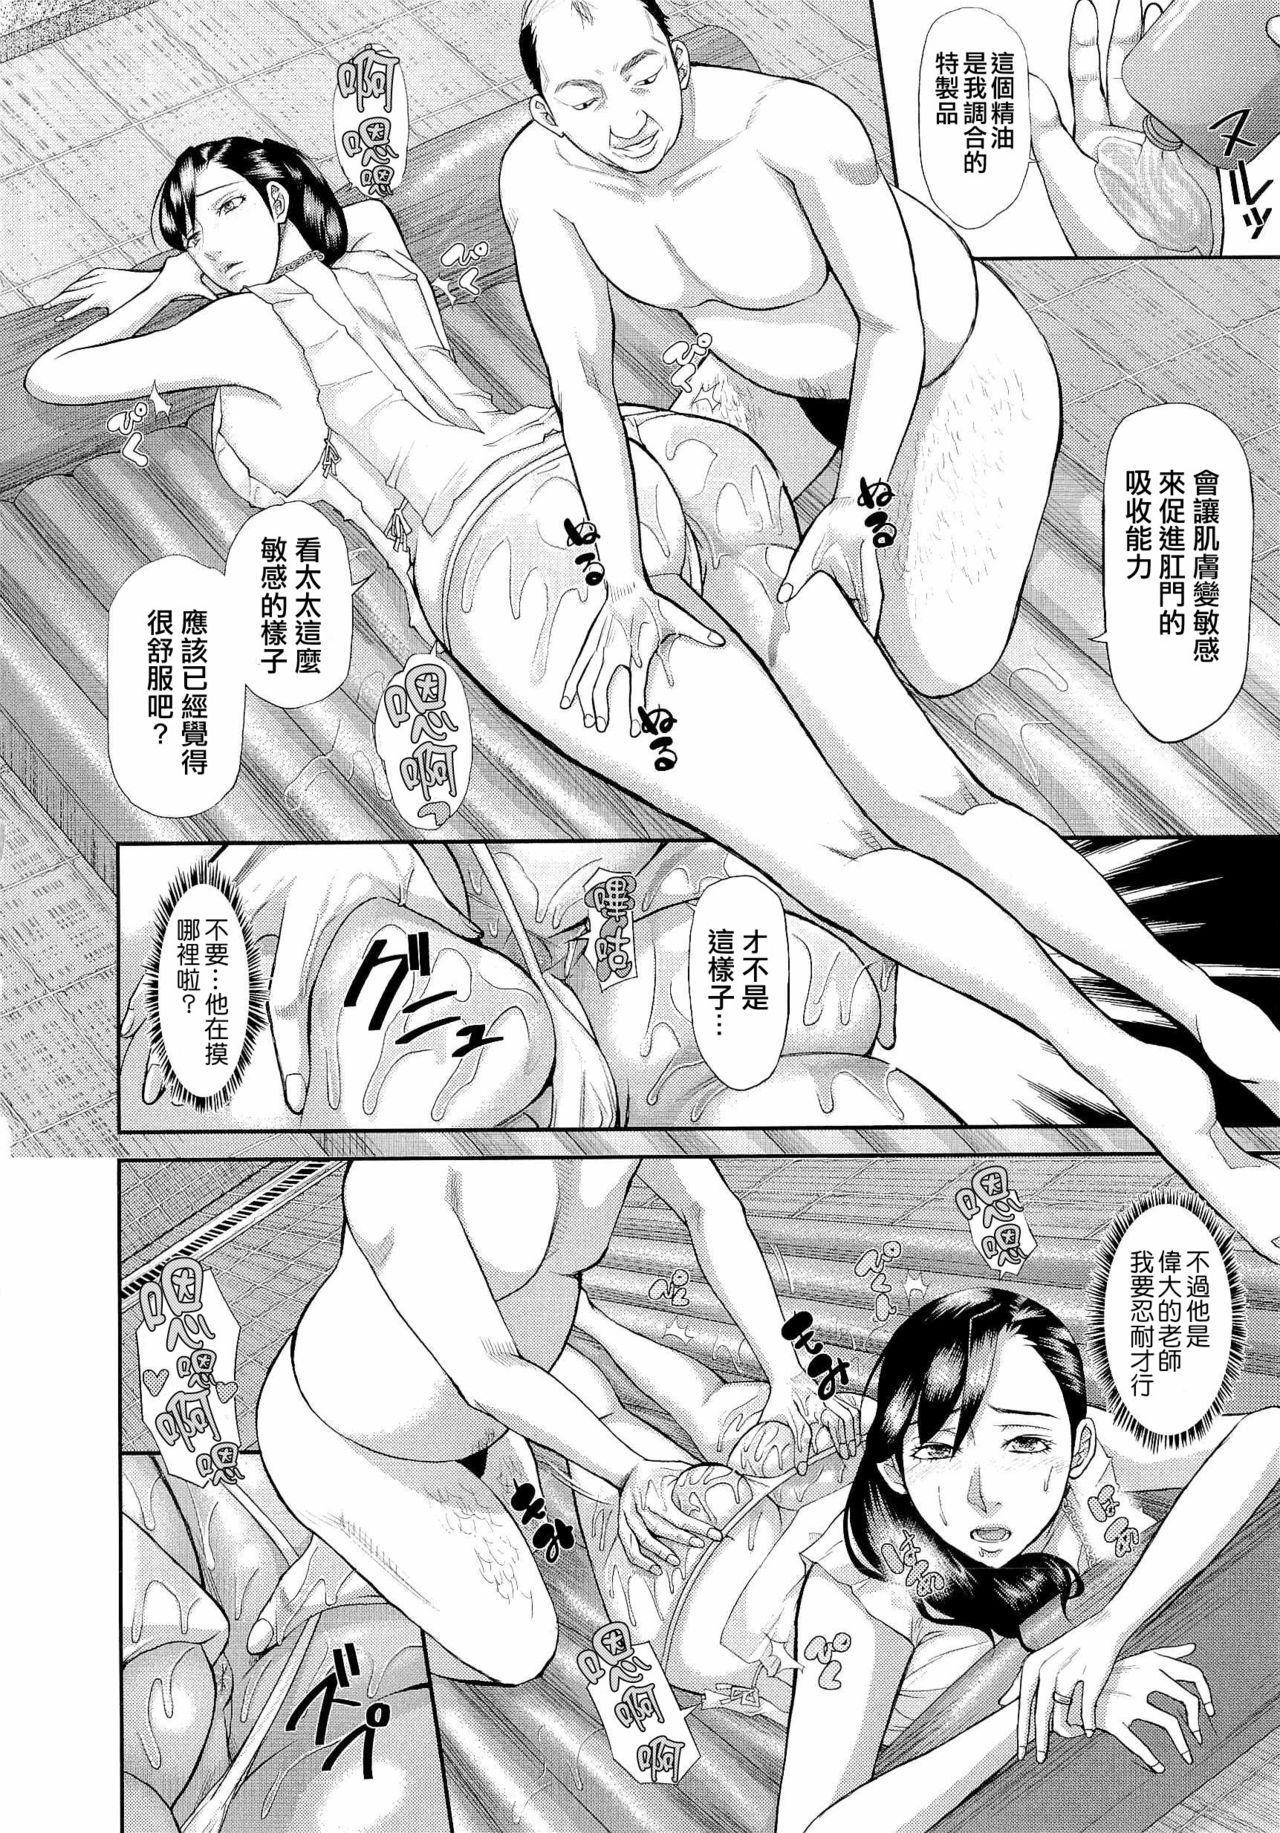 [Honebuto Danshaku] Innou Kaizou Program ~Oyako Zecchou Cult Ochi~ [Chinese]【不想记名重嵌--高质量图源】 19